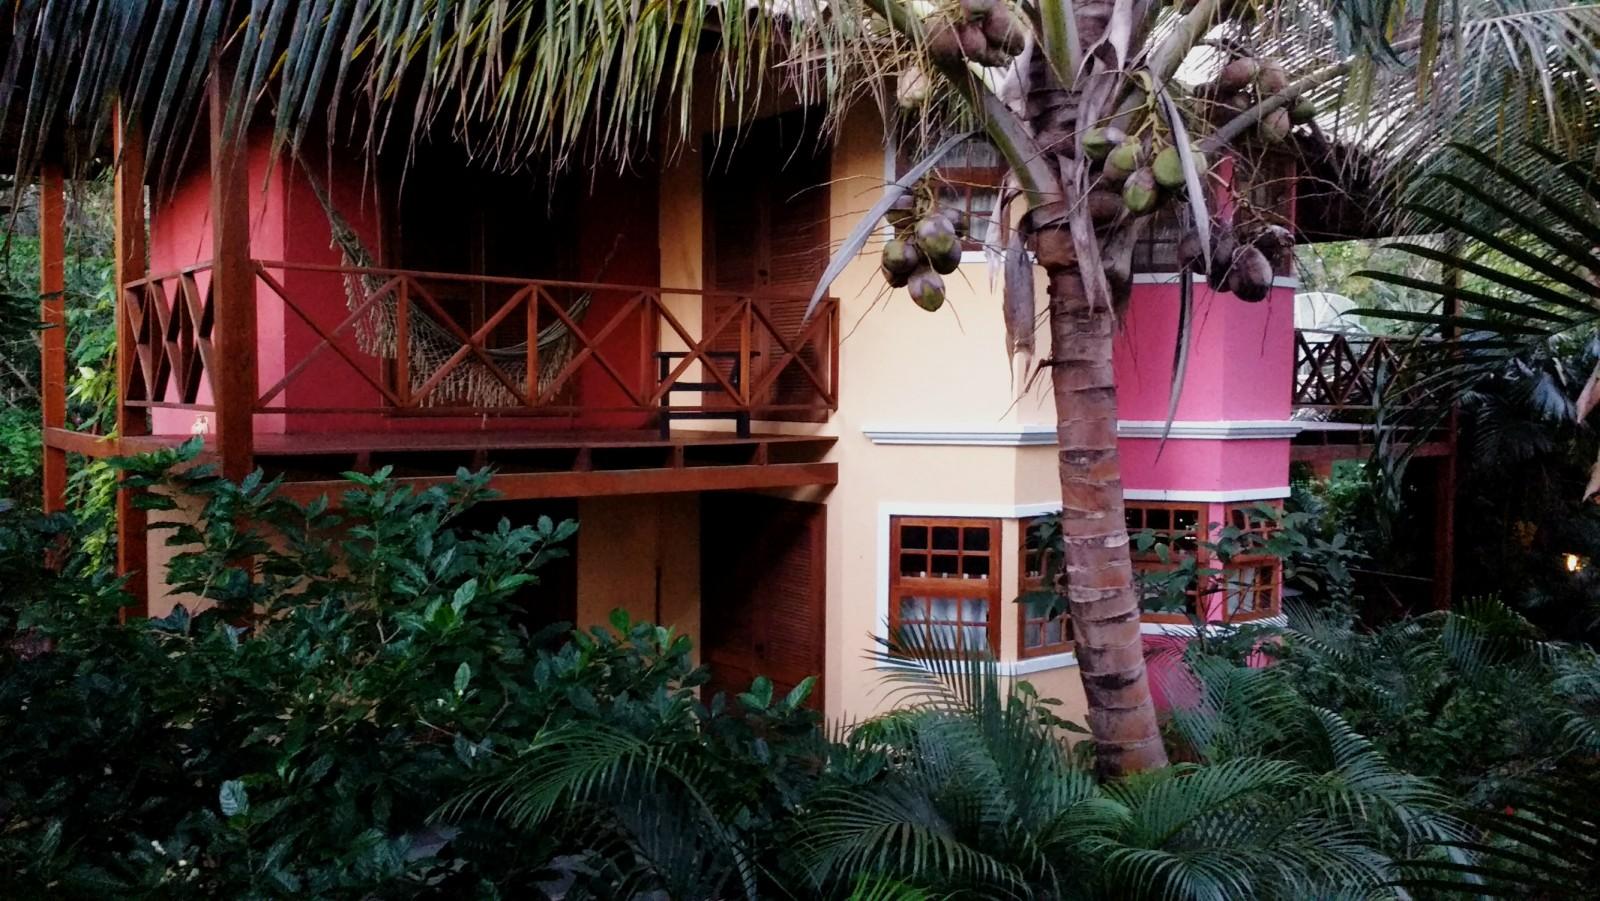 c3b2bf9df95 Vila Araticum Praia - Santo André BAHIA - Vila de Santo André ...